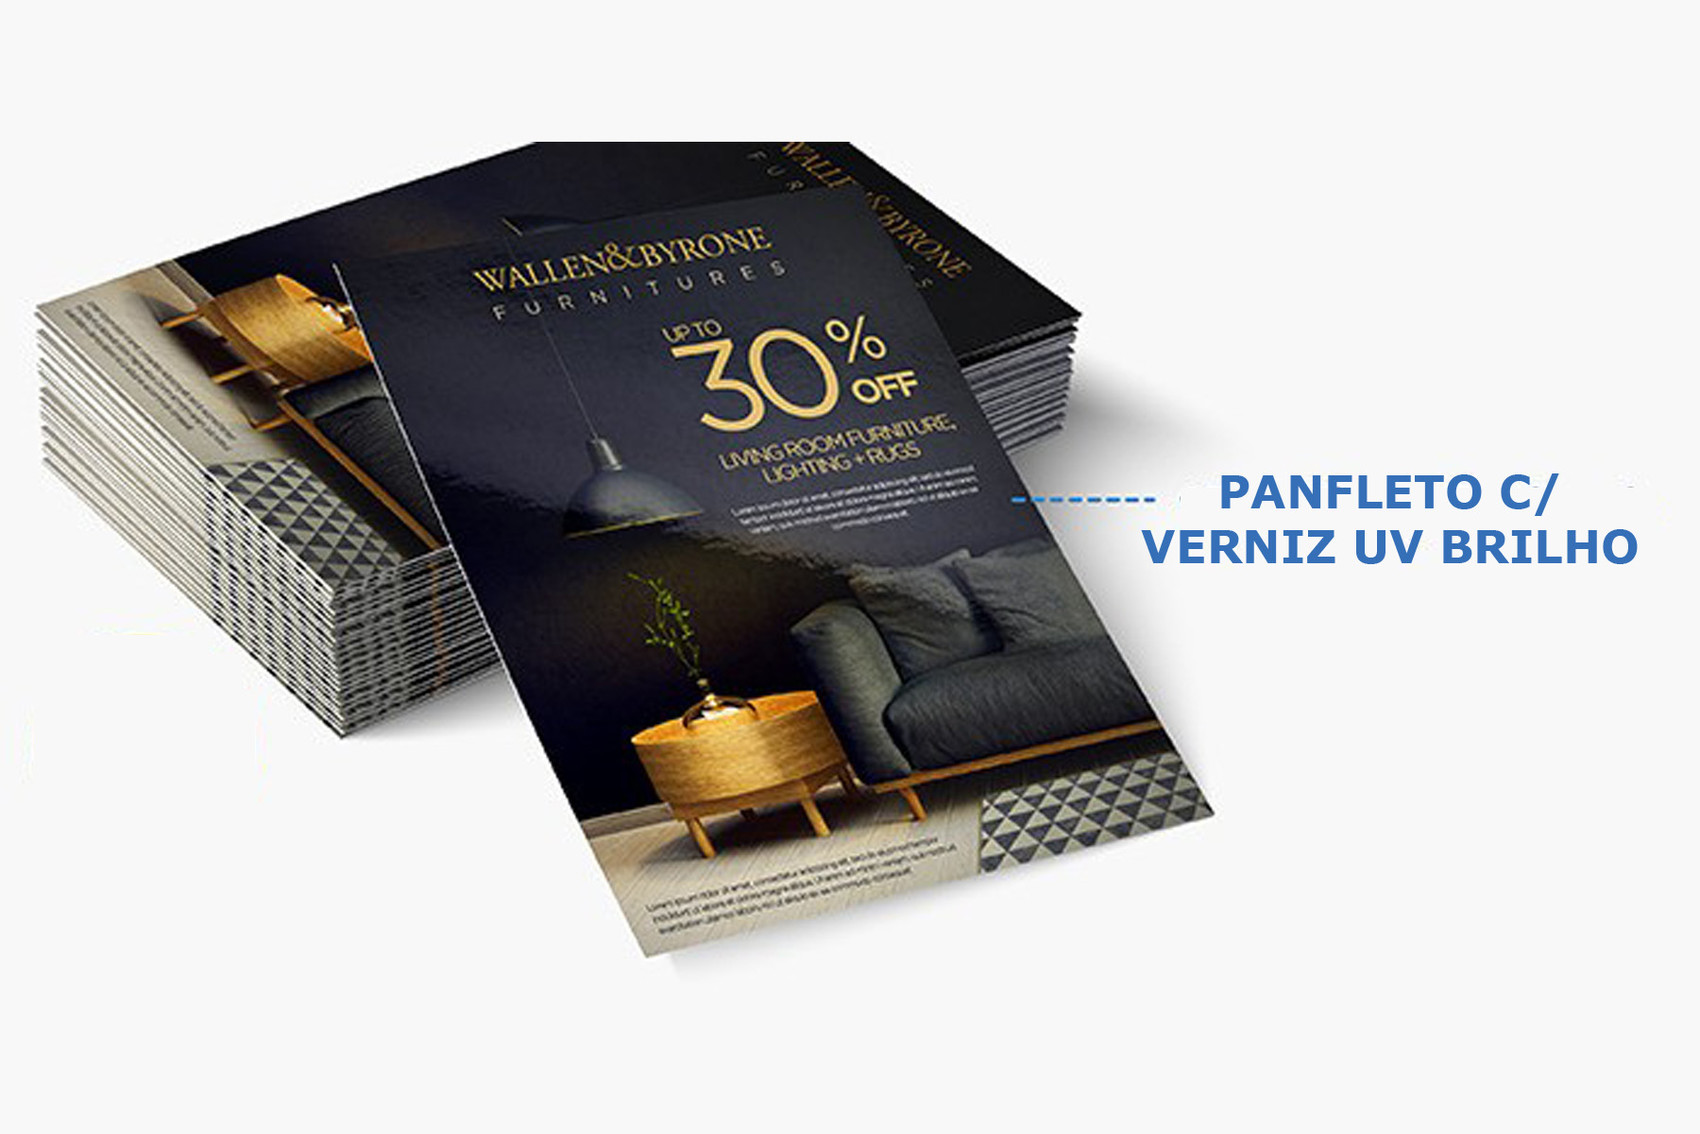 Panfletos / Folhetos / Flyers - 14 x 20 cm